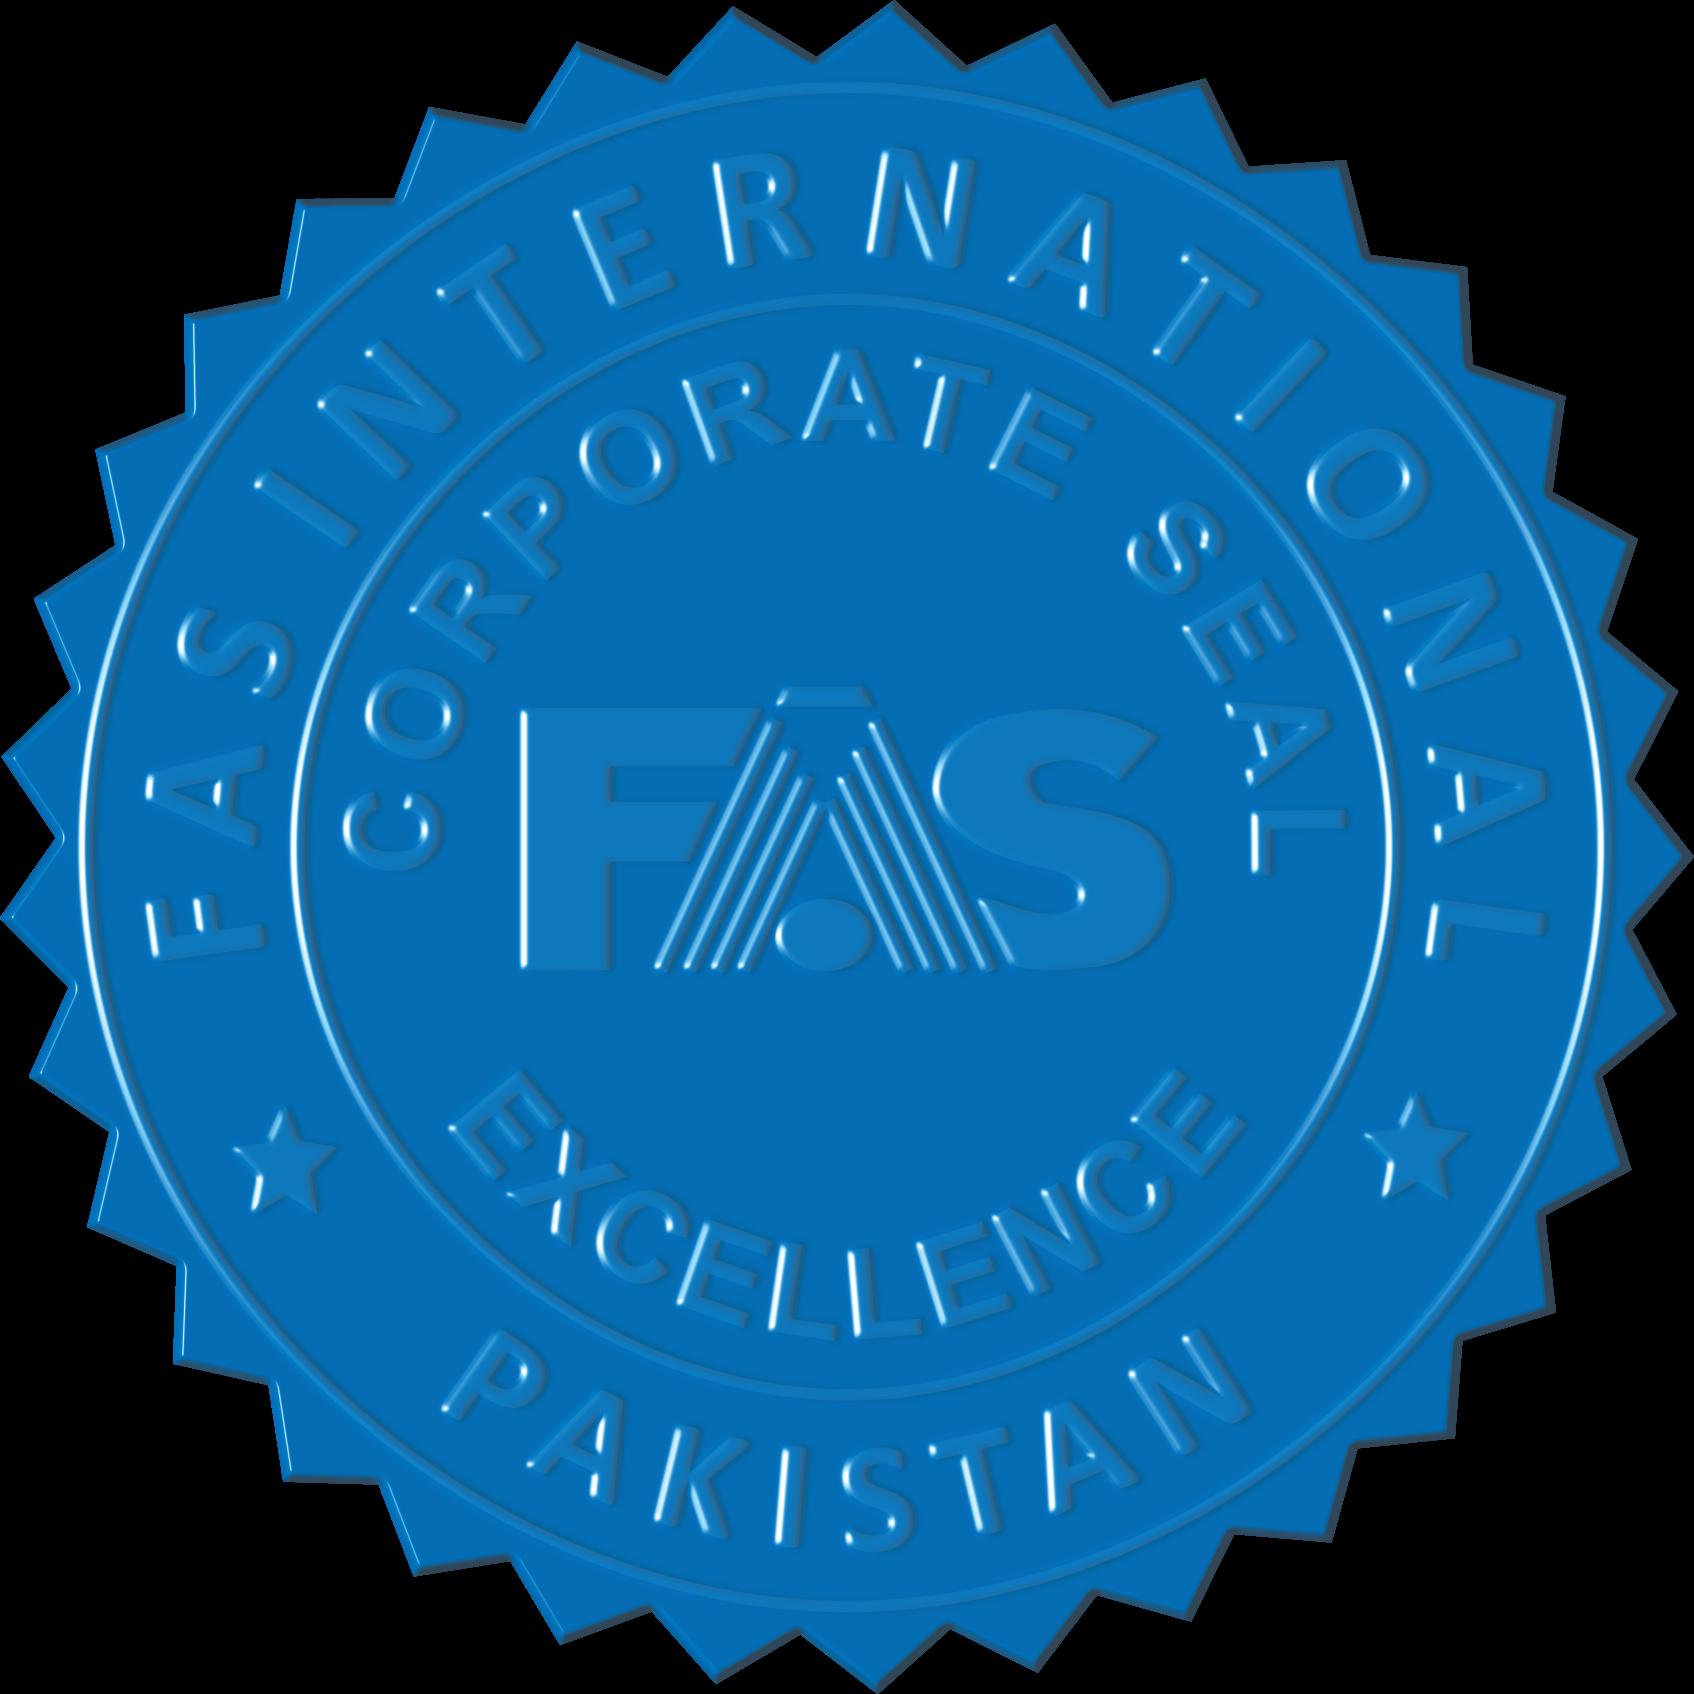 Verification fas international pakistan. Stamp clipart certification